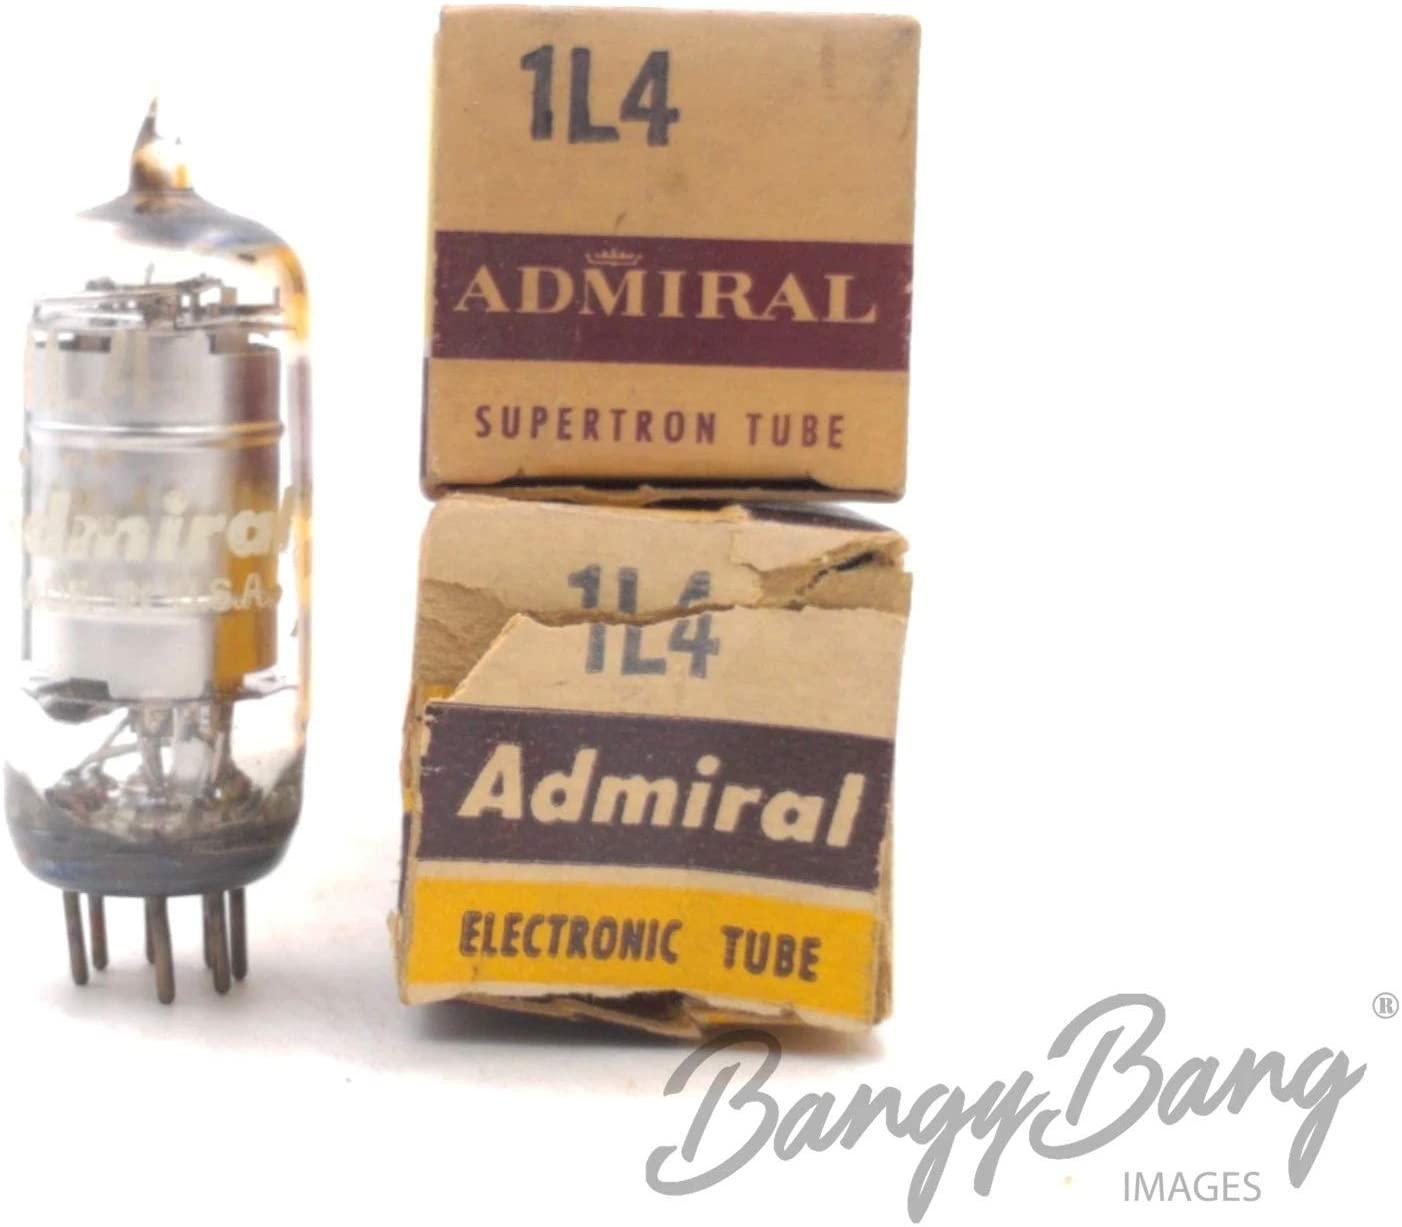 2 Vintage Admiral 1L4/DF92/CV1758 Miniature Voltage Amplifier Pentode - BangyBang Tubes